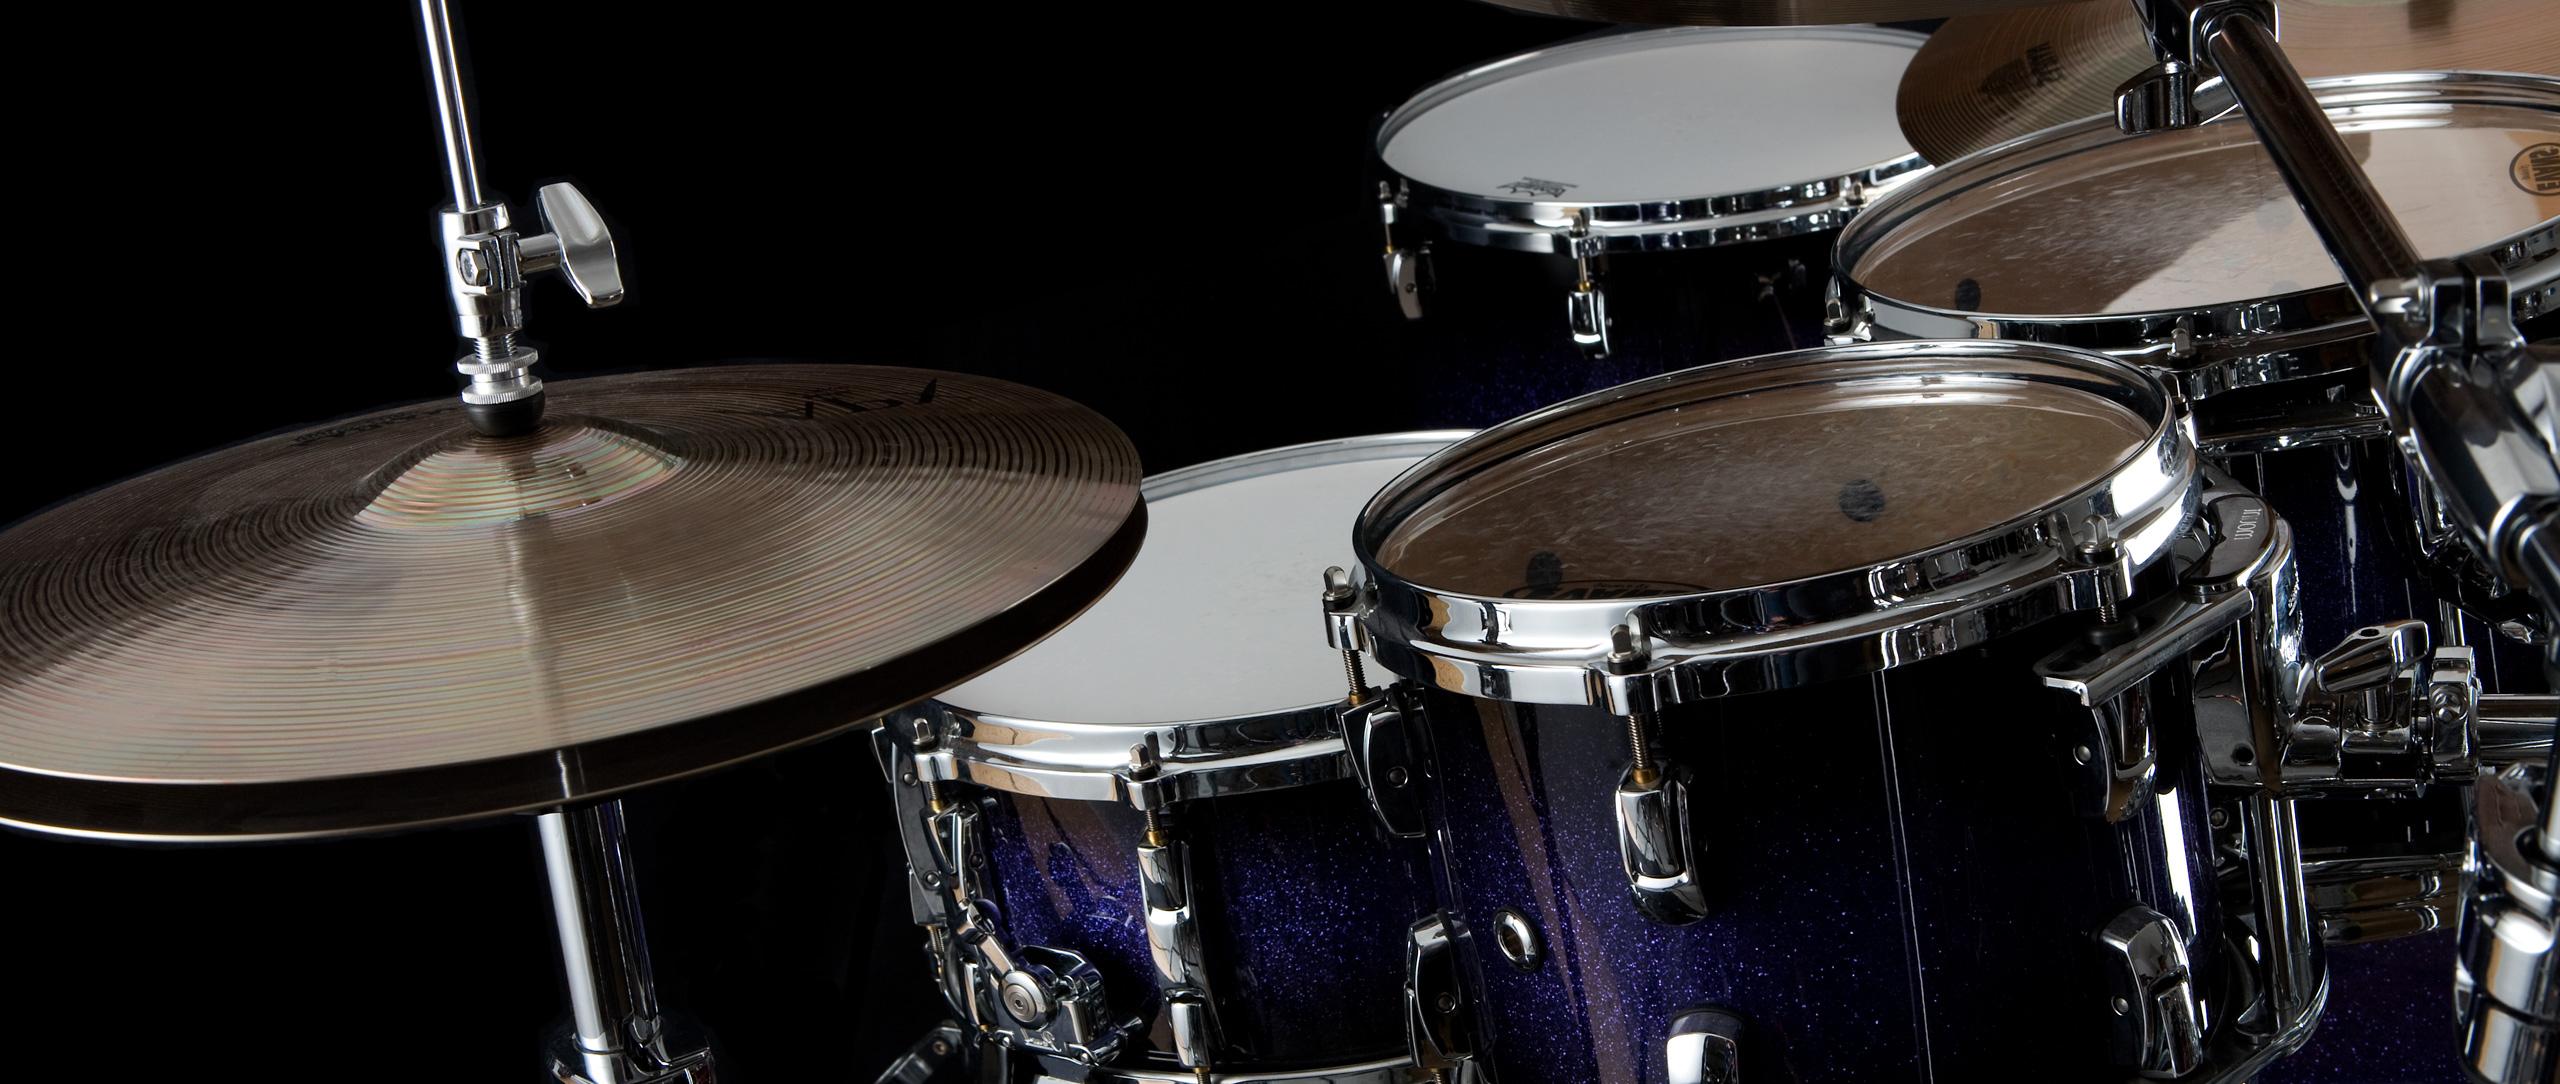 Drums Wallpapers: Drum Wallpaper HD